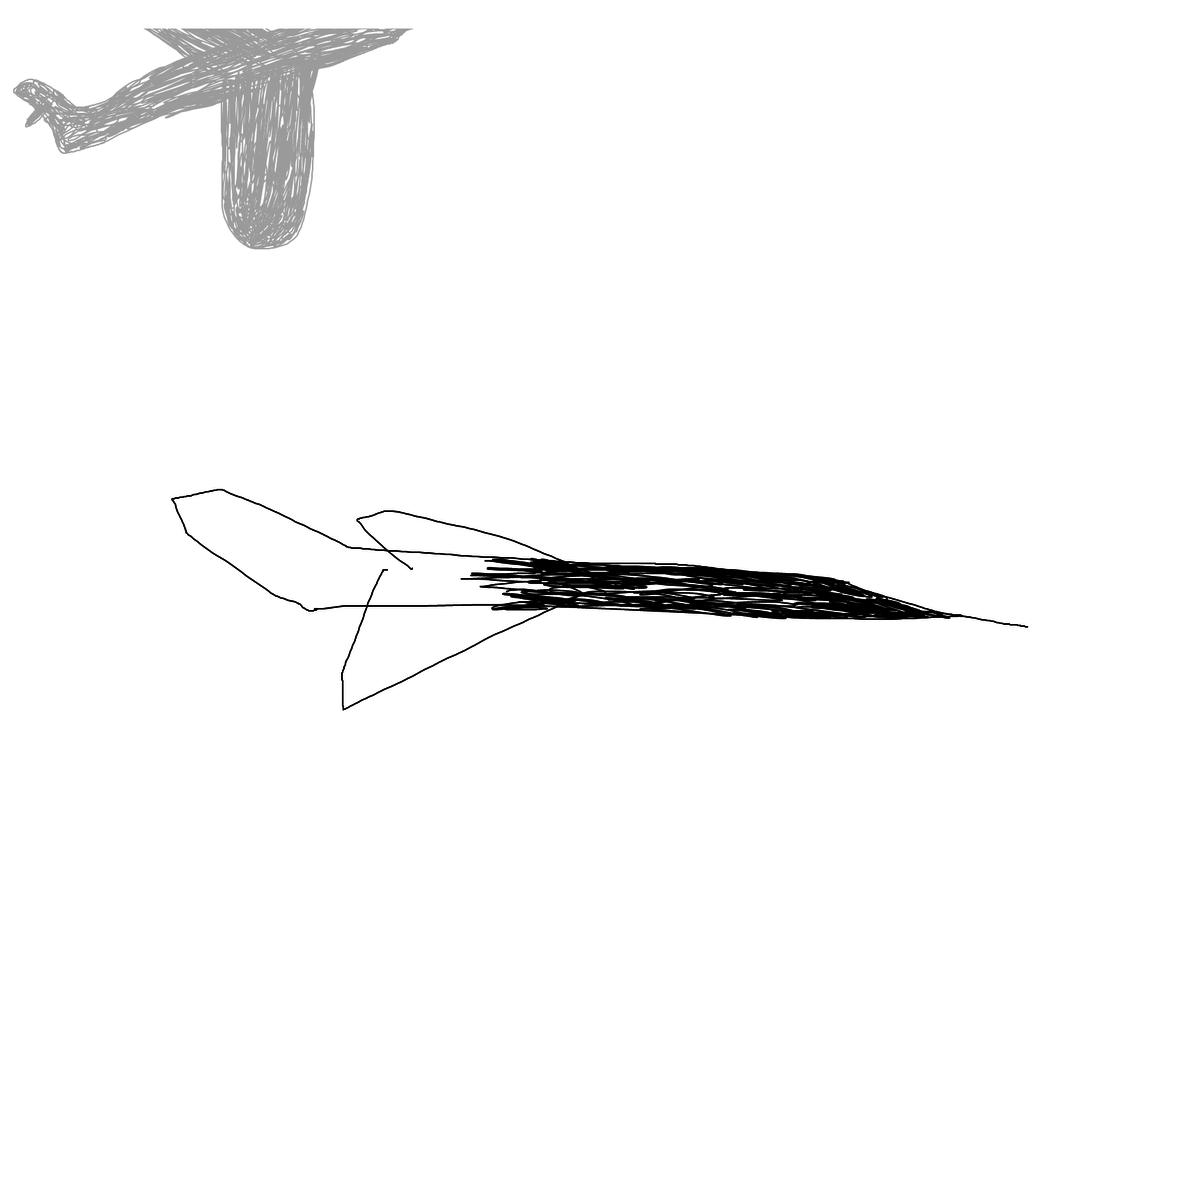 BAAAM drawing#54 lat:52.4751510620117200lng: 13.4068460464477540